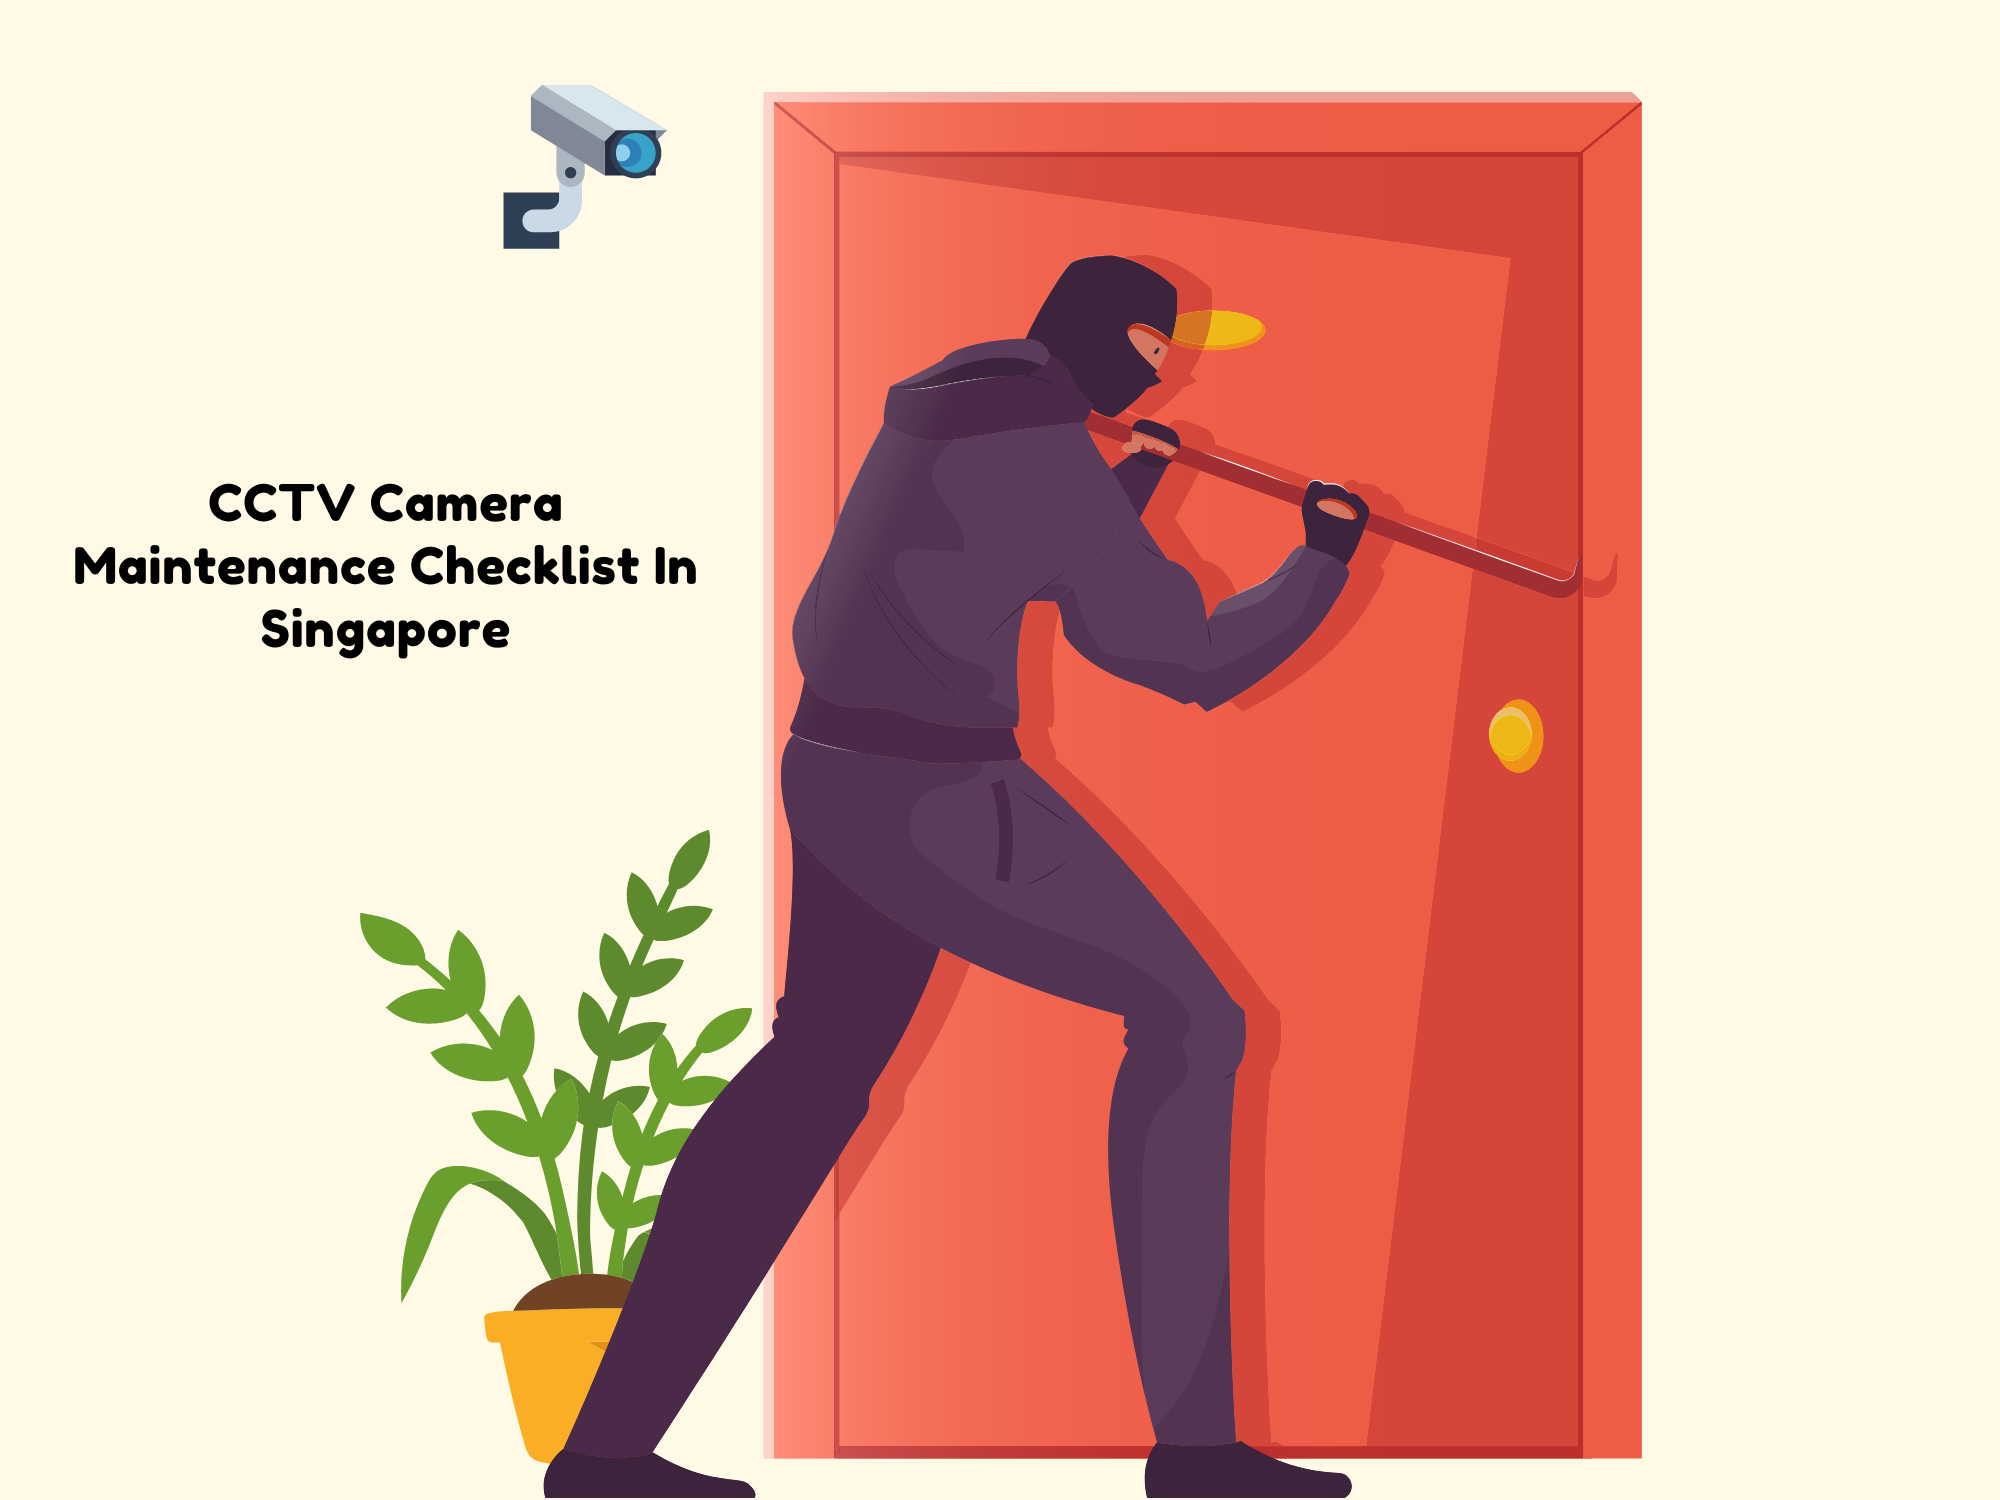 CCTV-Camera-Maintenance-Checklist-In-Singapore